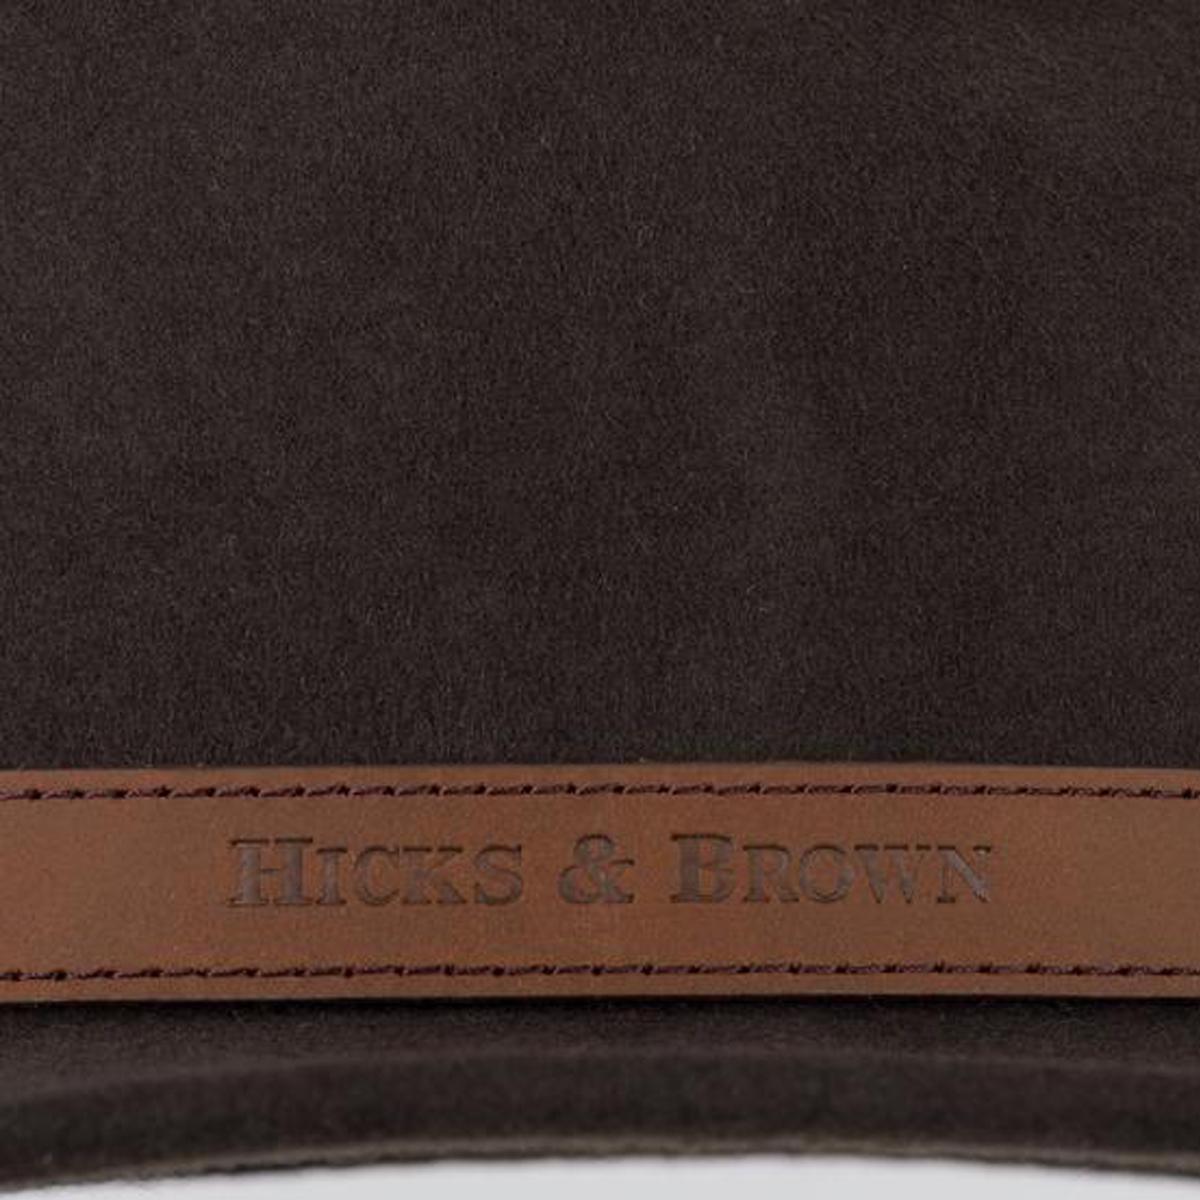 Hicks & Brown The Suffolk Fedora (Guinea & Pheasant Feather) – Dark Brown